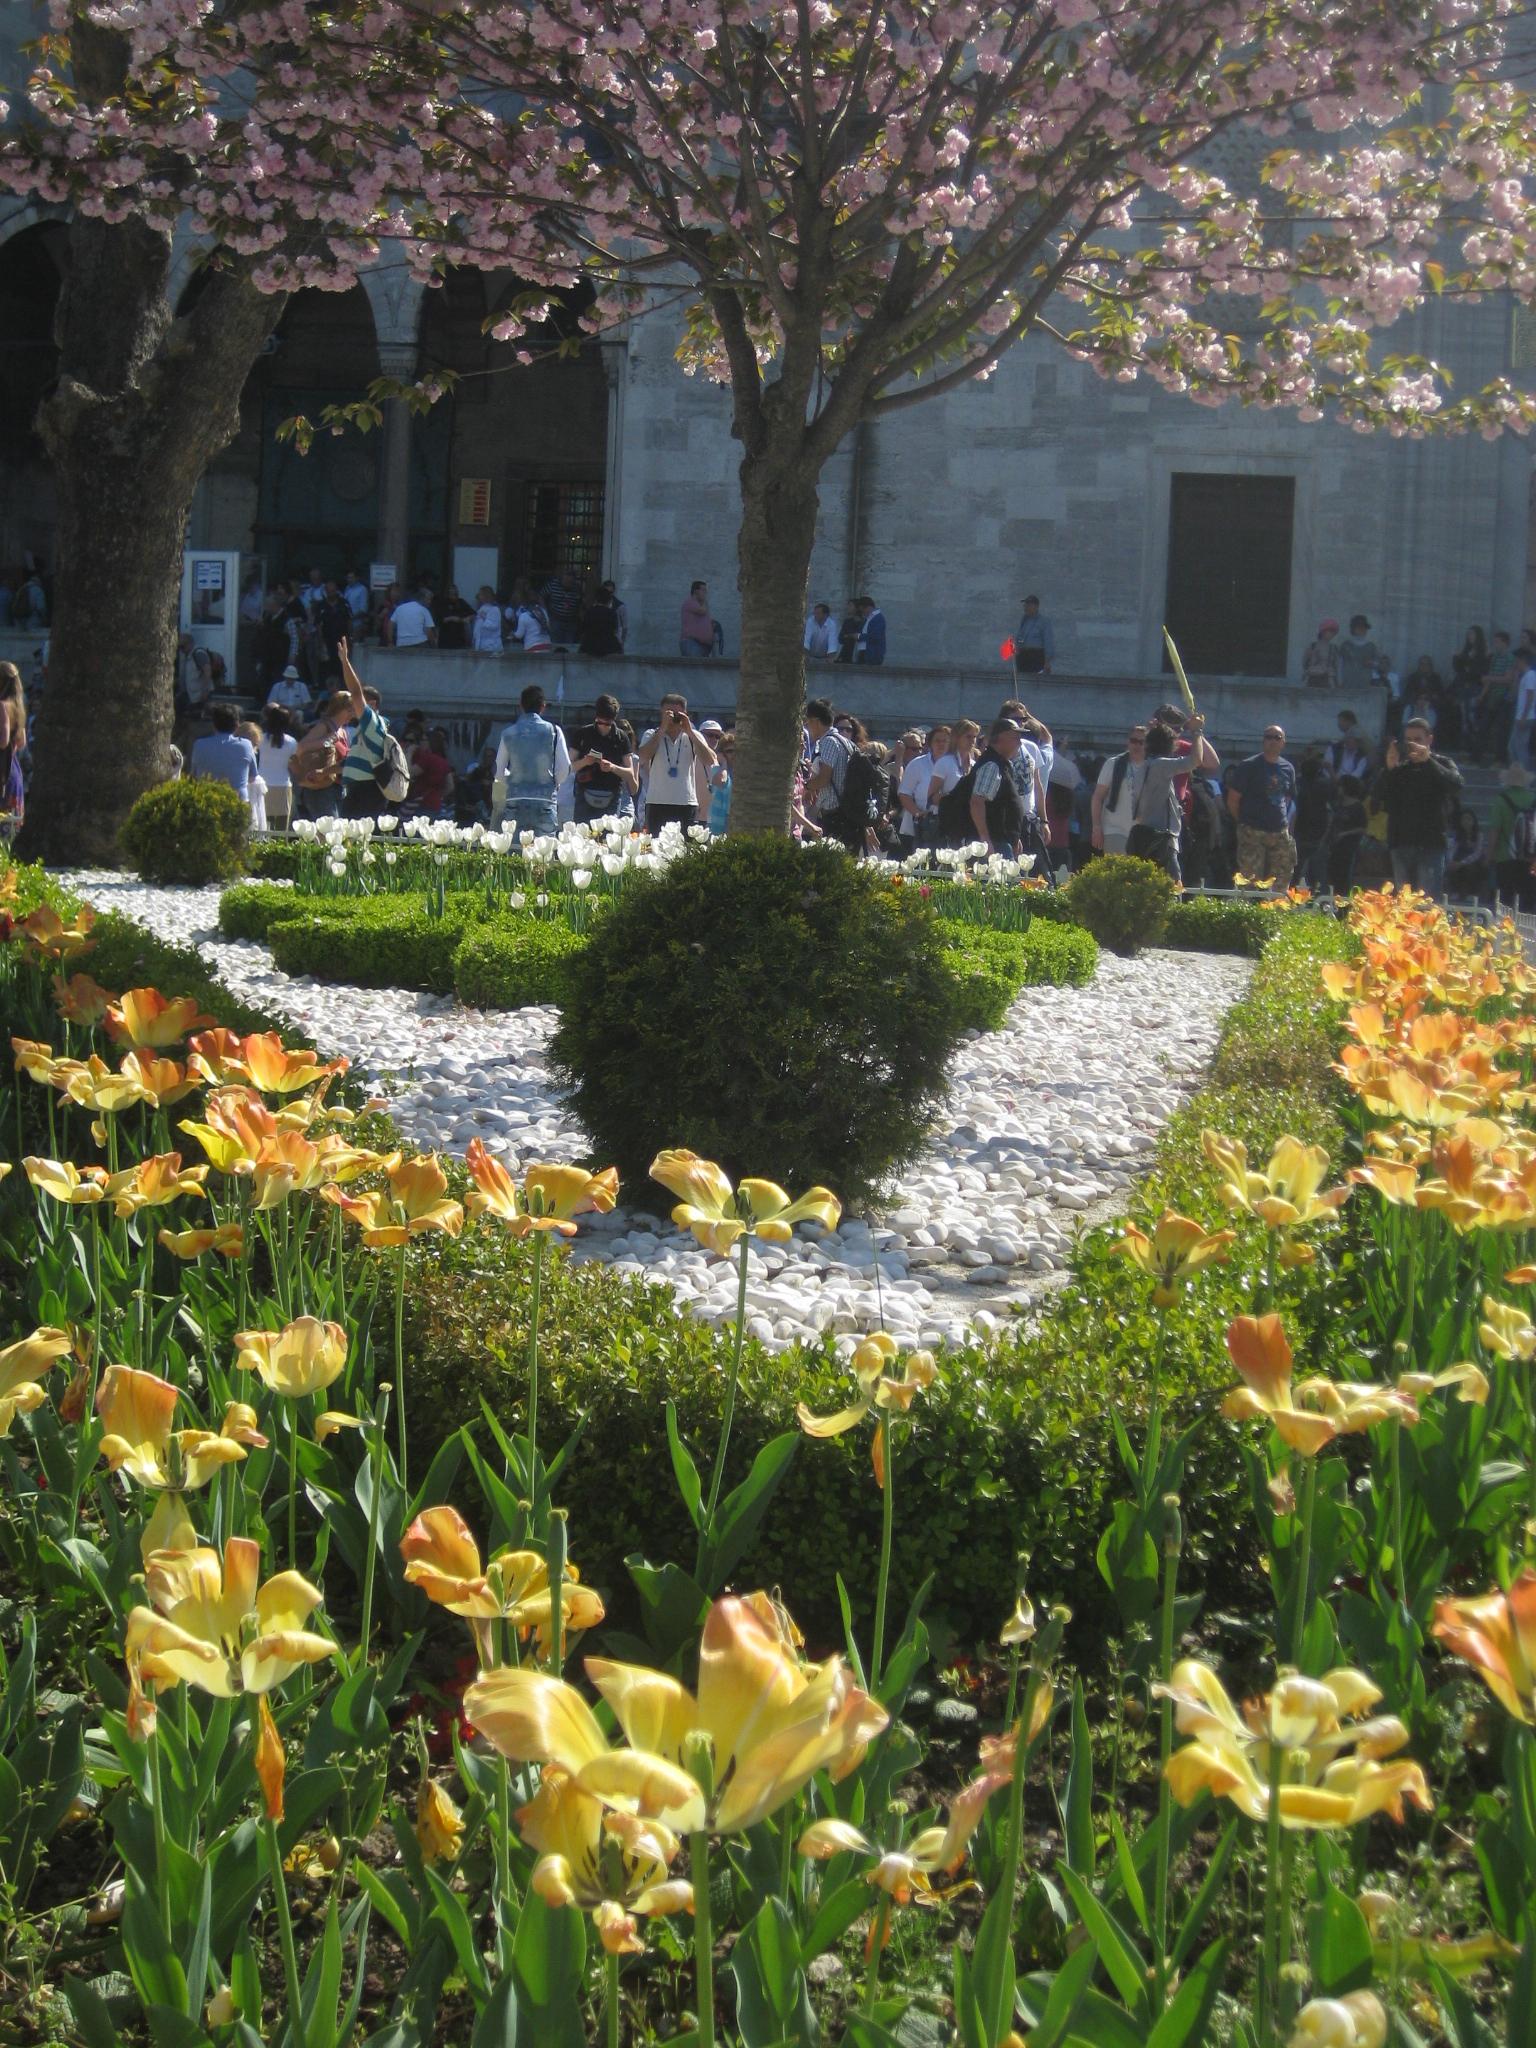 Filebeautiful blooming flower in garden of sultan ahmed mosque 04 filebeautiful blooming flower in garden of sultan ahmed mosque 04g izmirmasajfo